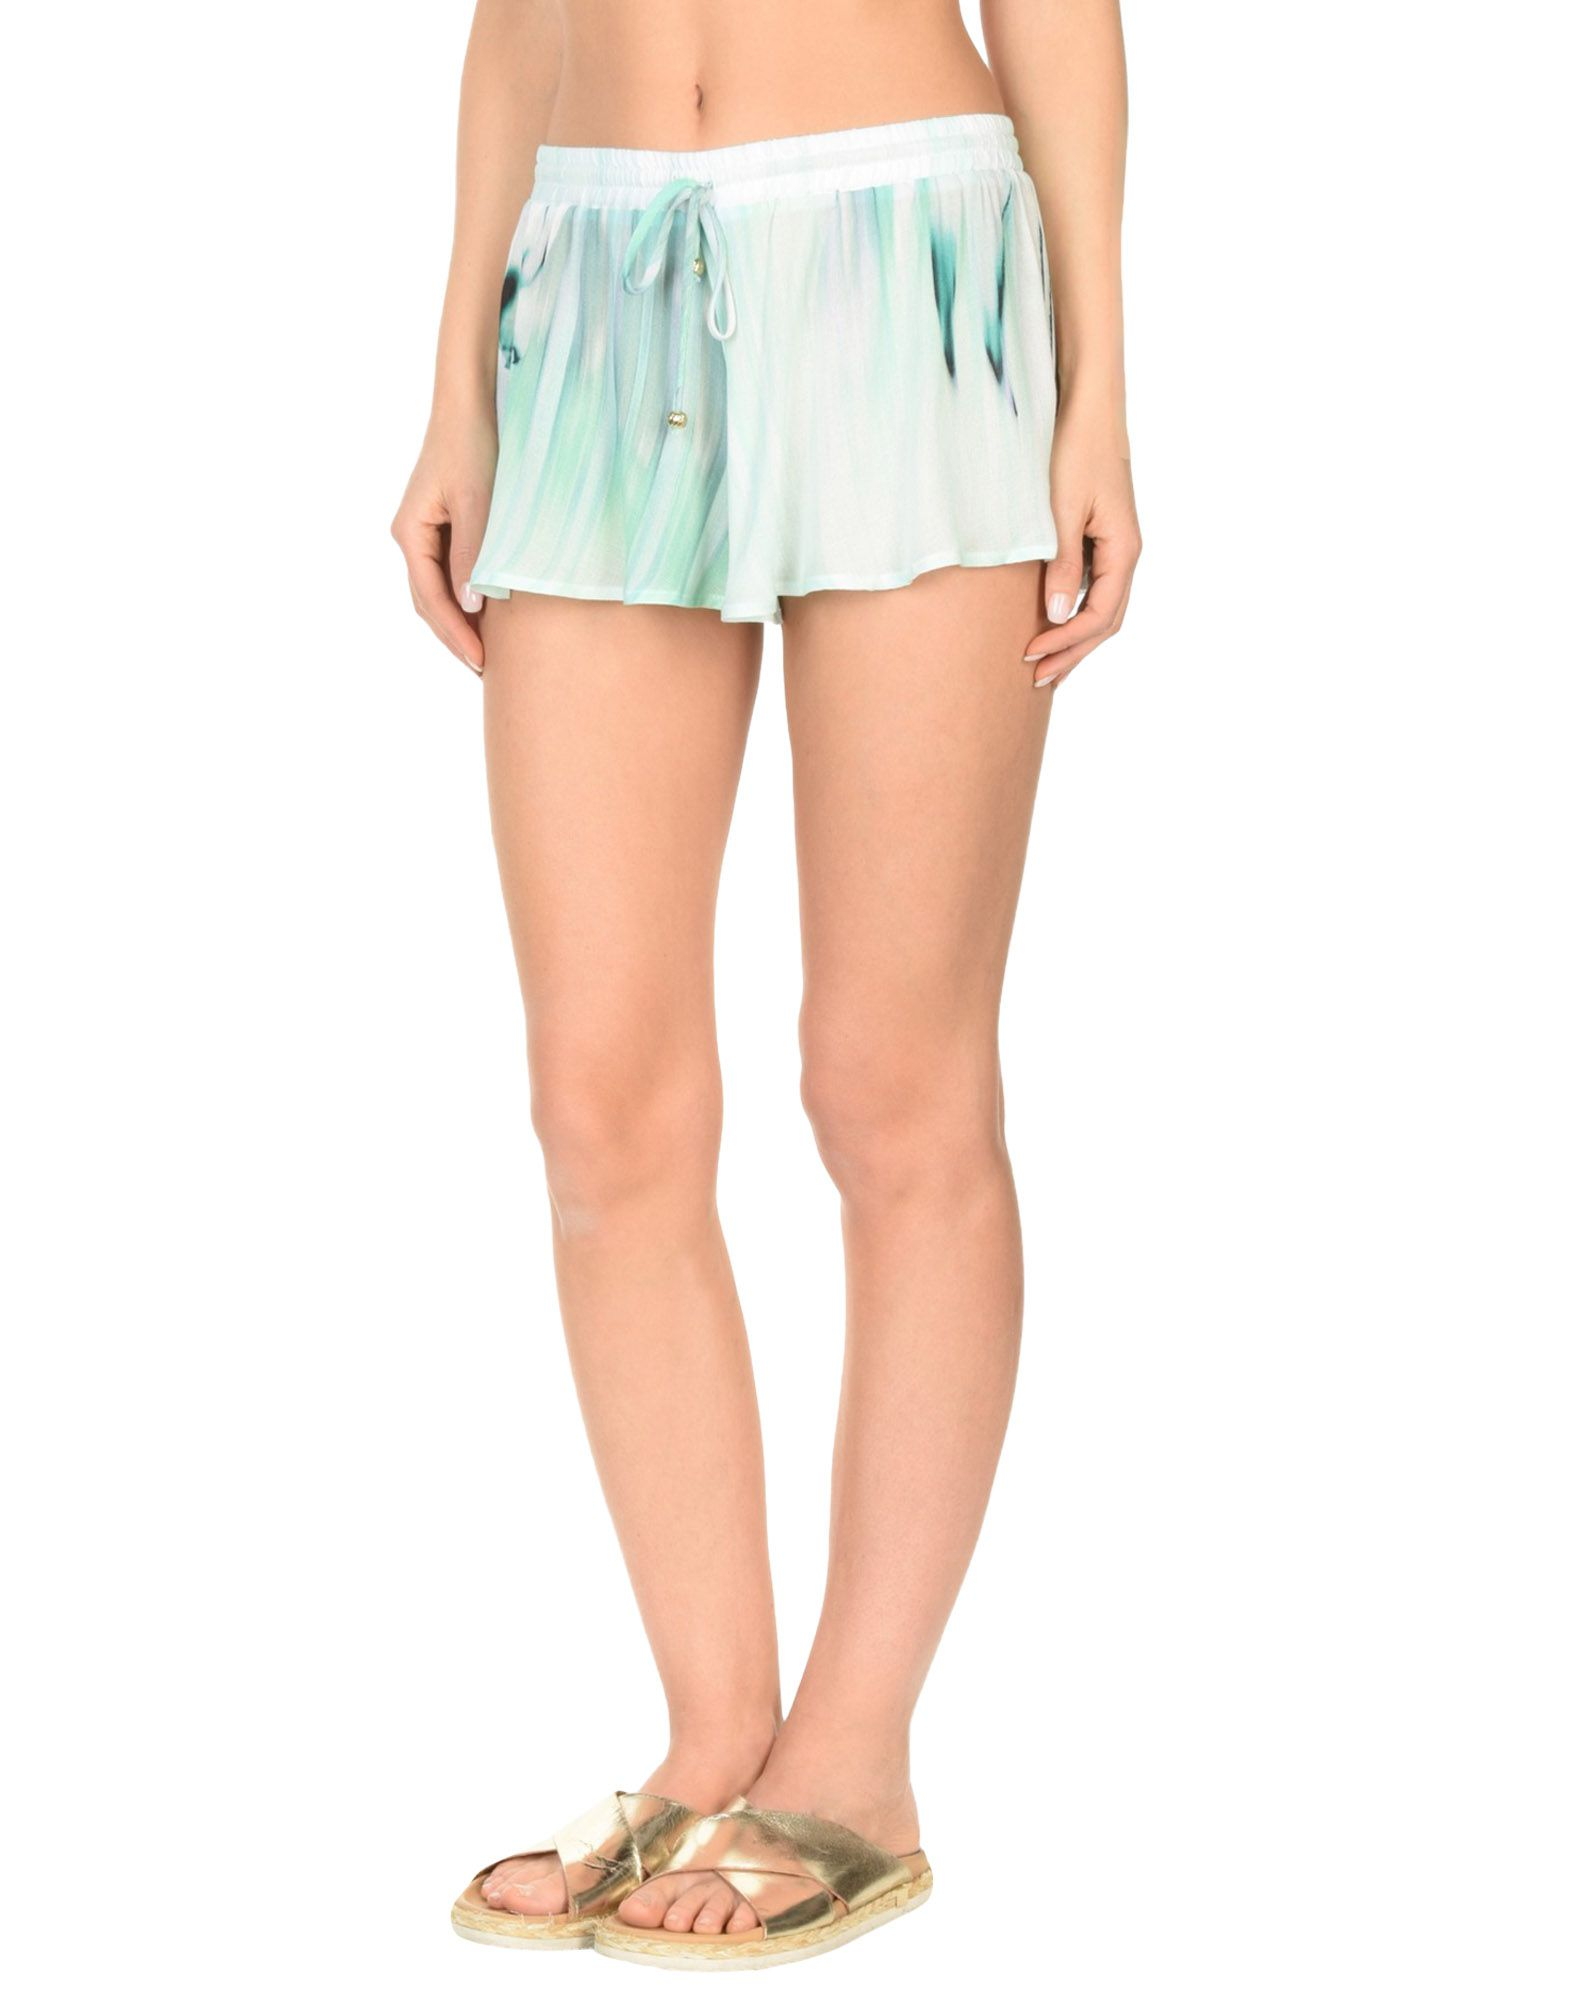 ROBERTO CAVALLI BEACHWEAR Пляжные брюки и шорты roberto verino vv tropic